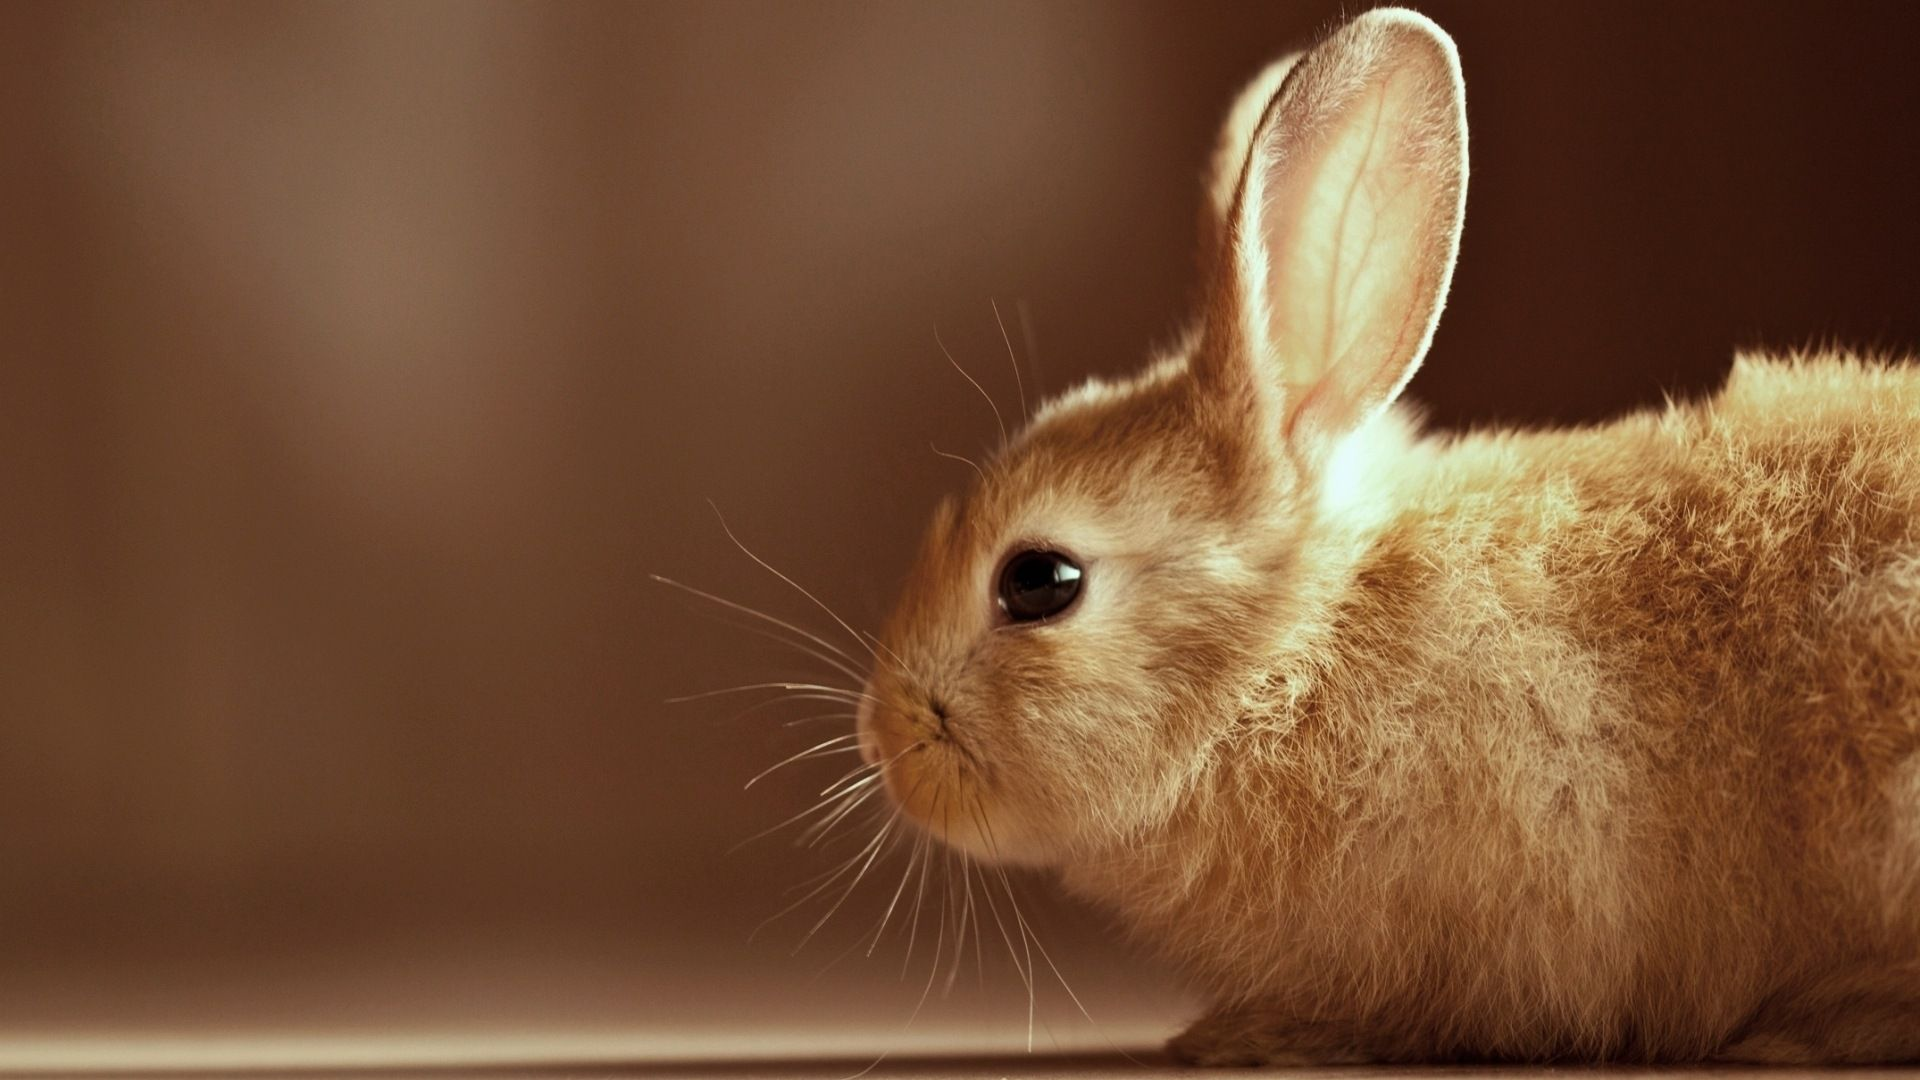 The Wallpaper Bunnies